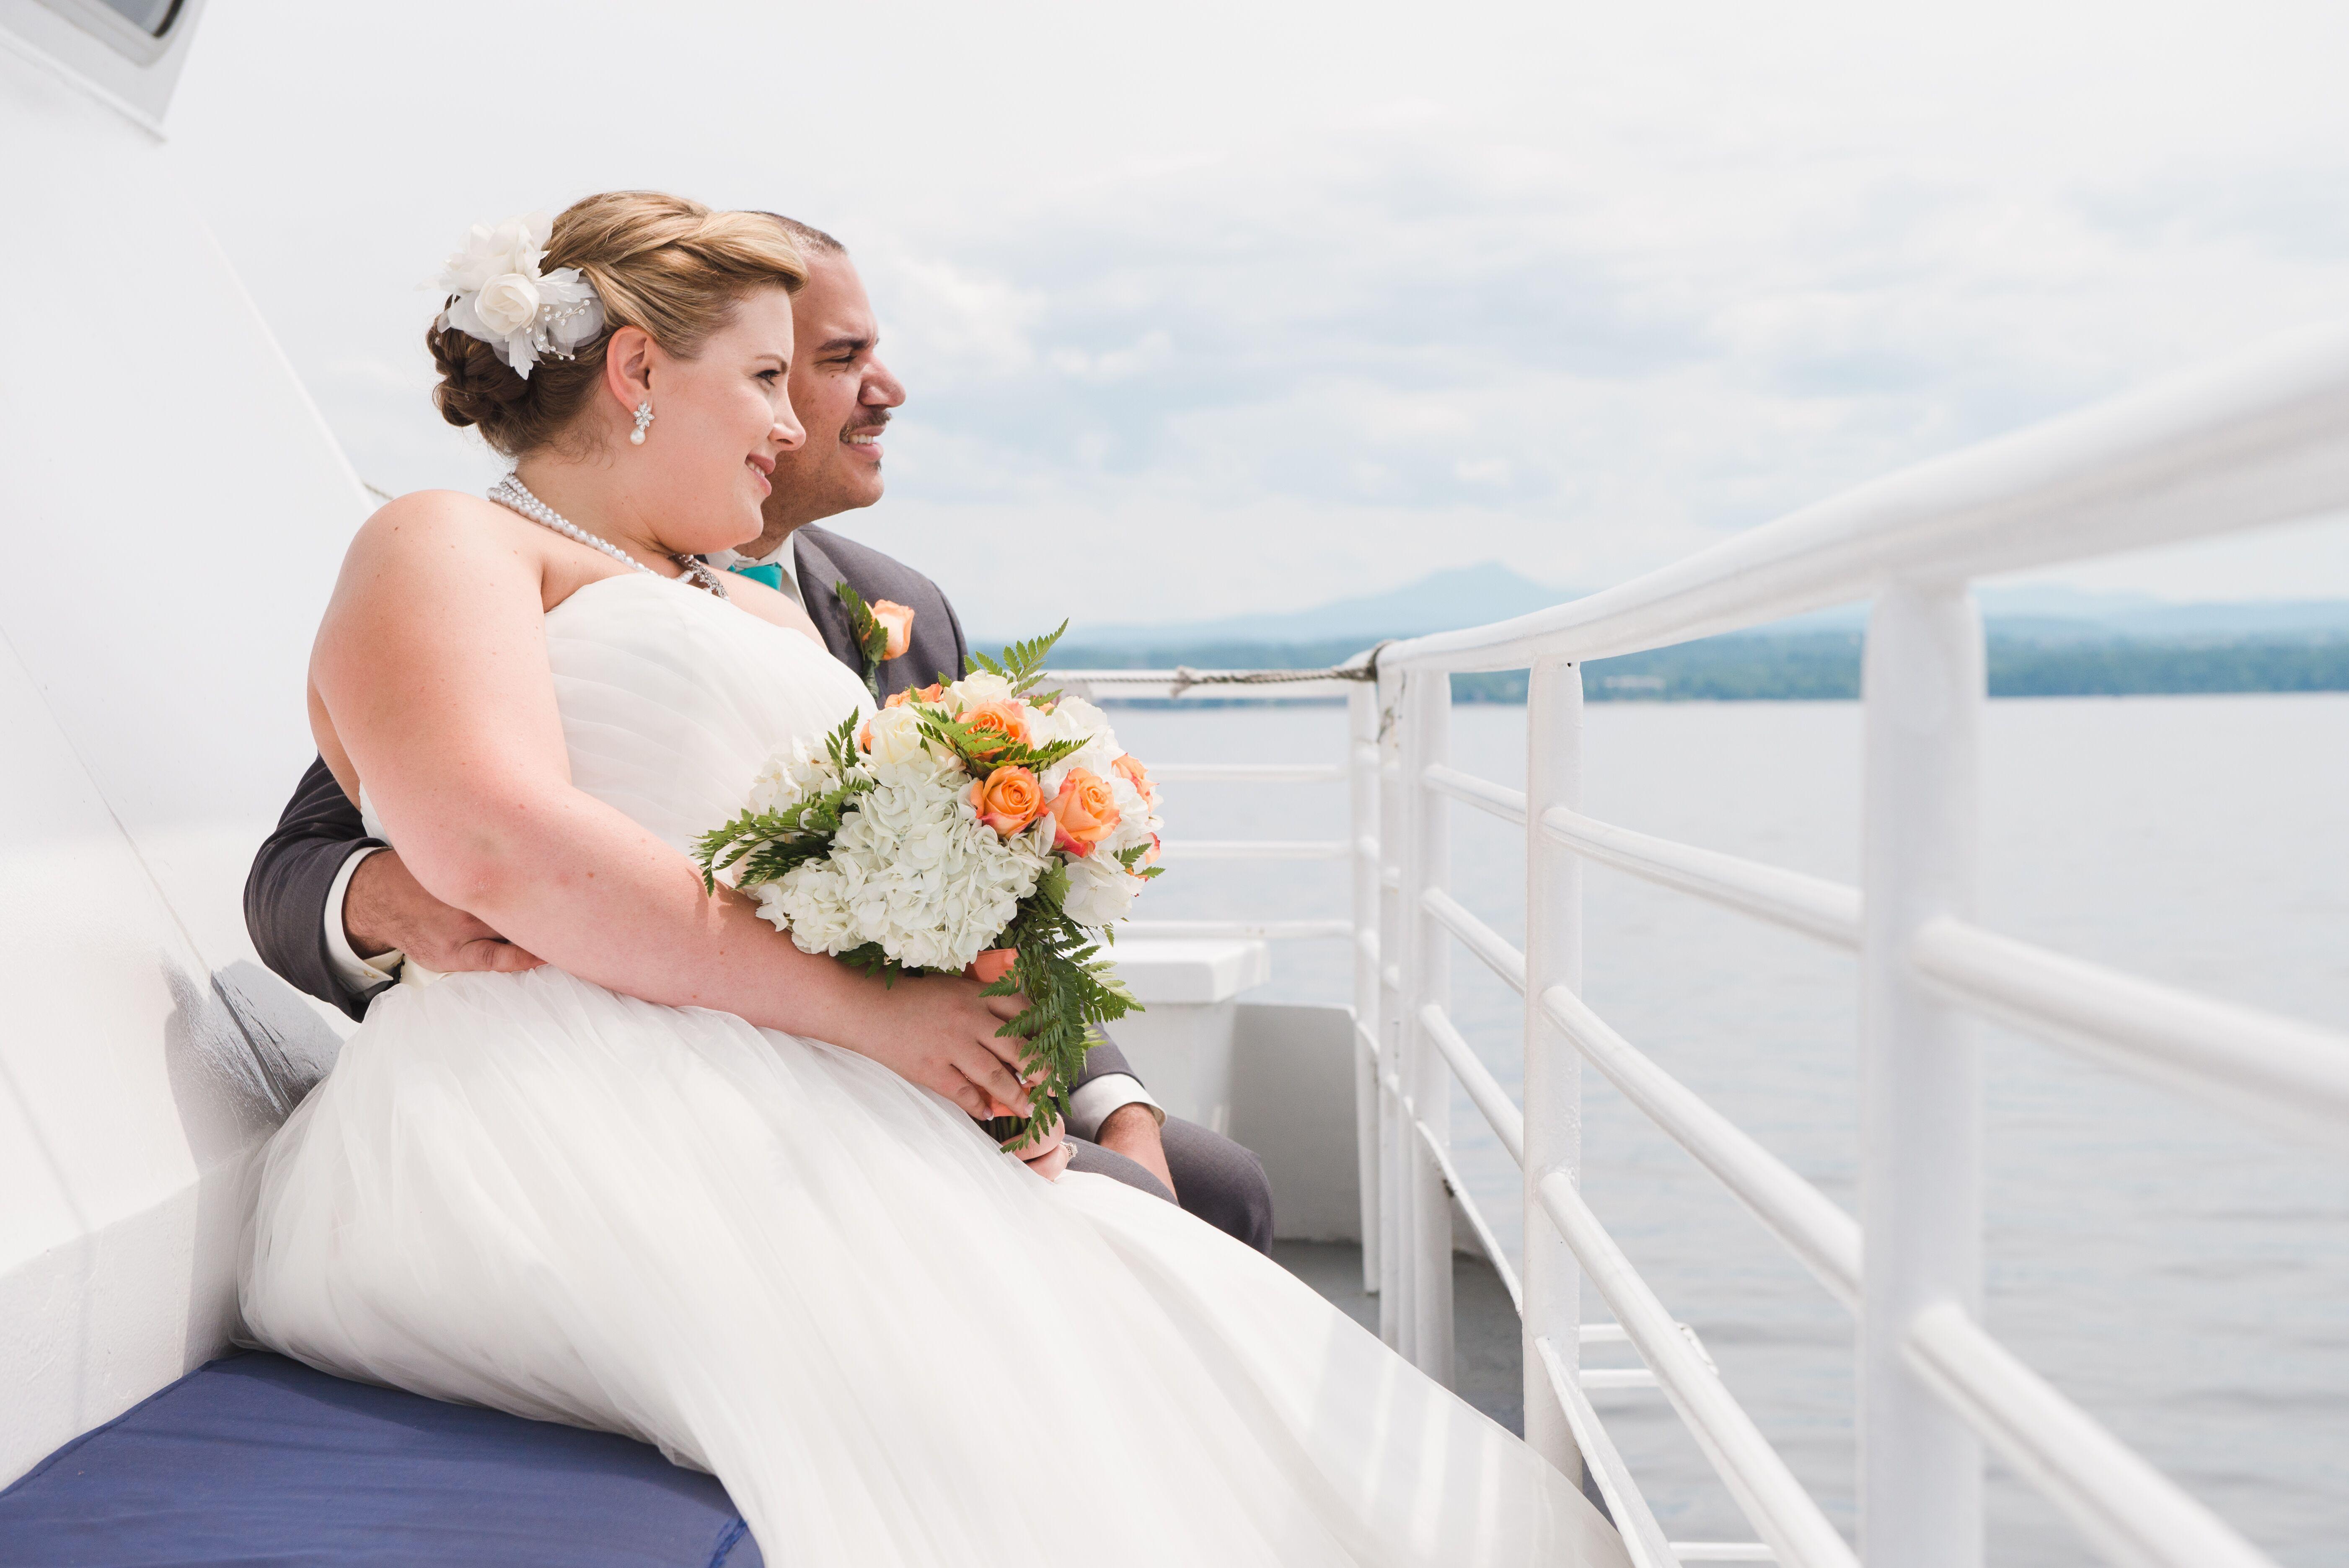 A Nautical Cruise Wedding at the Spirit of Ethan Allen in Burlington ...